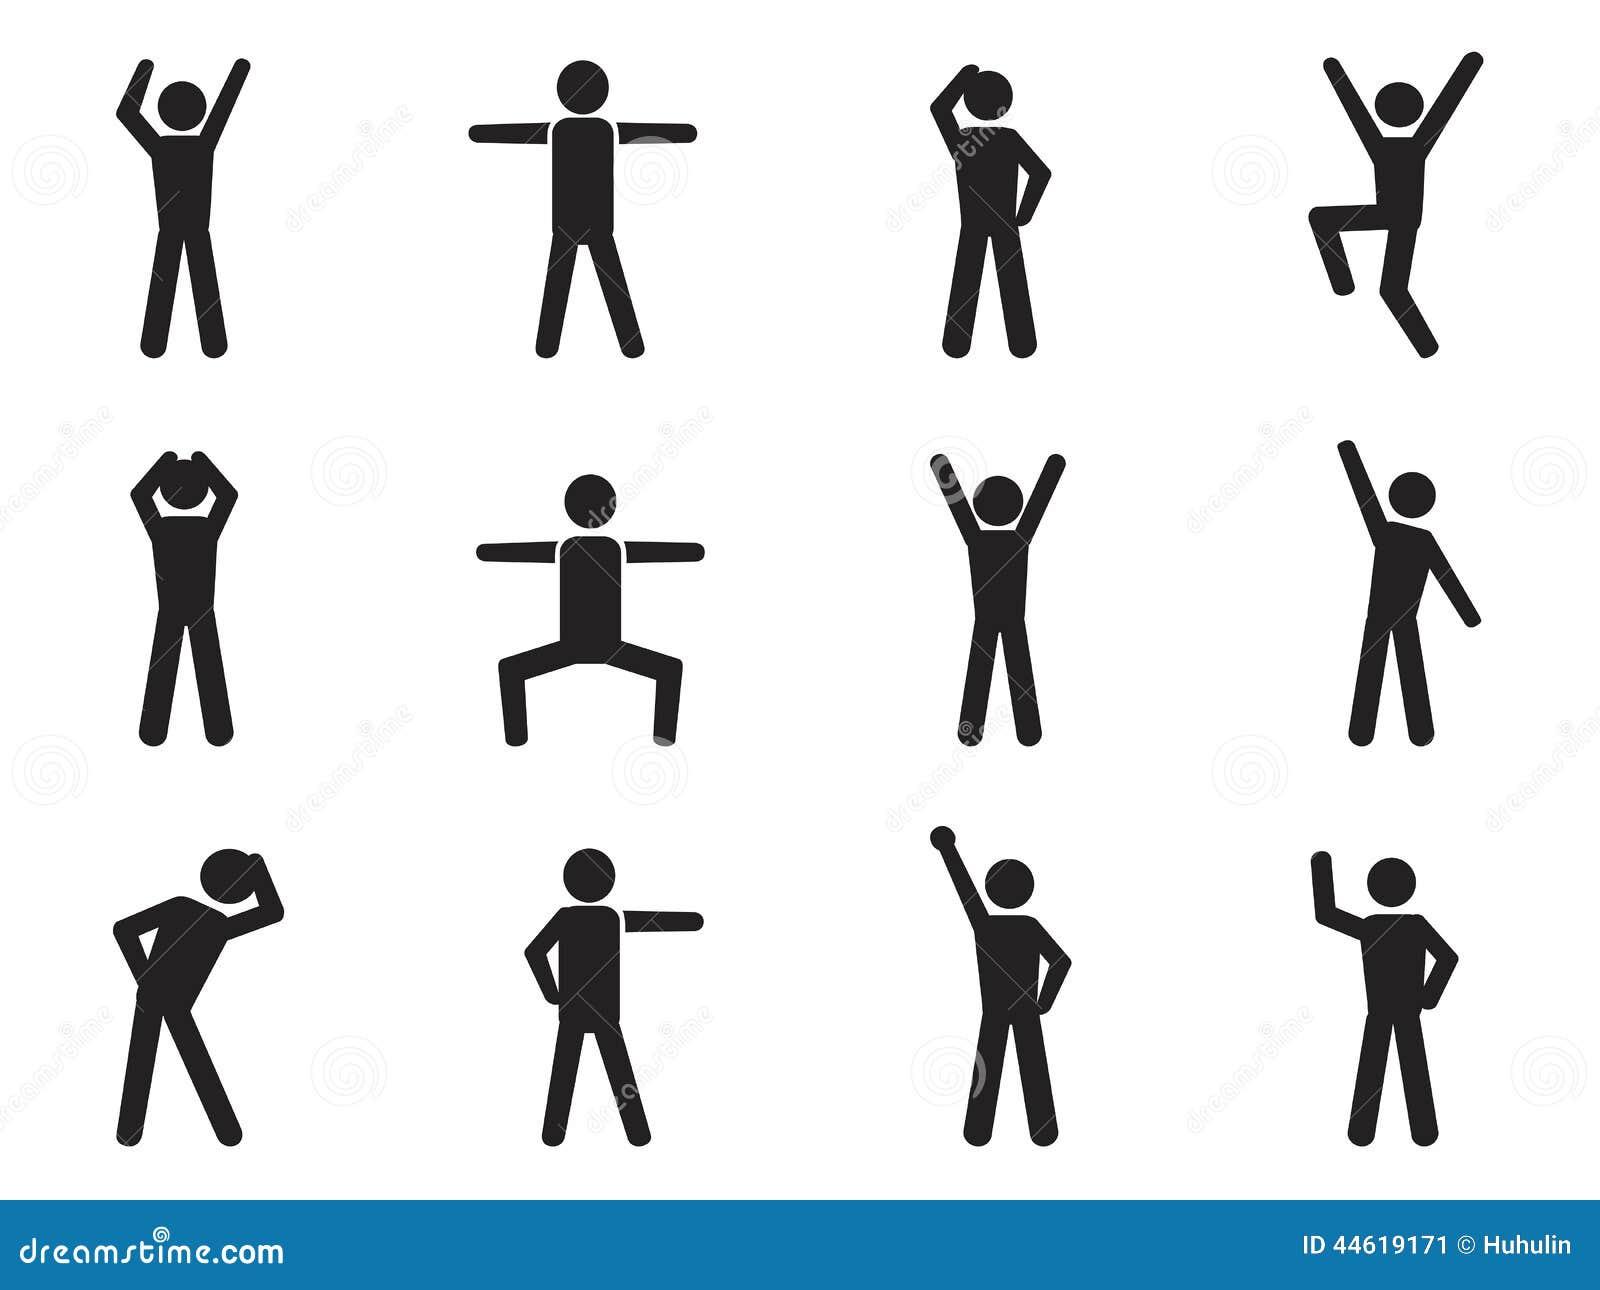 Stick figure posture icons